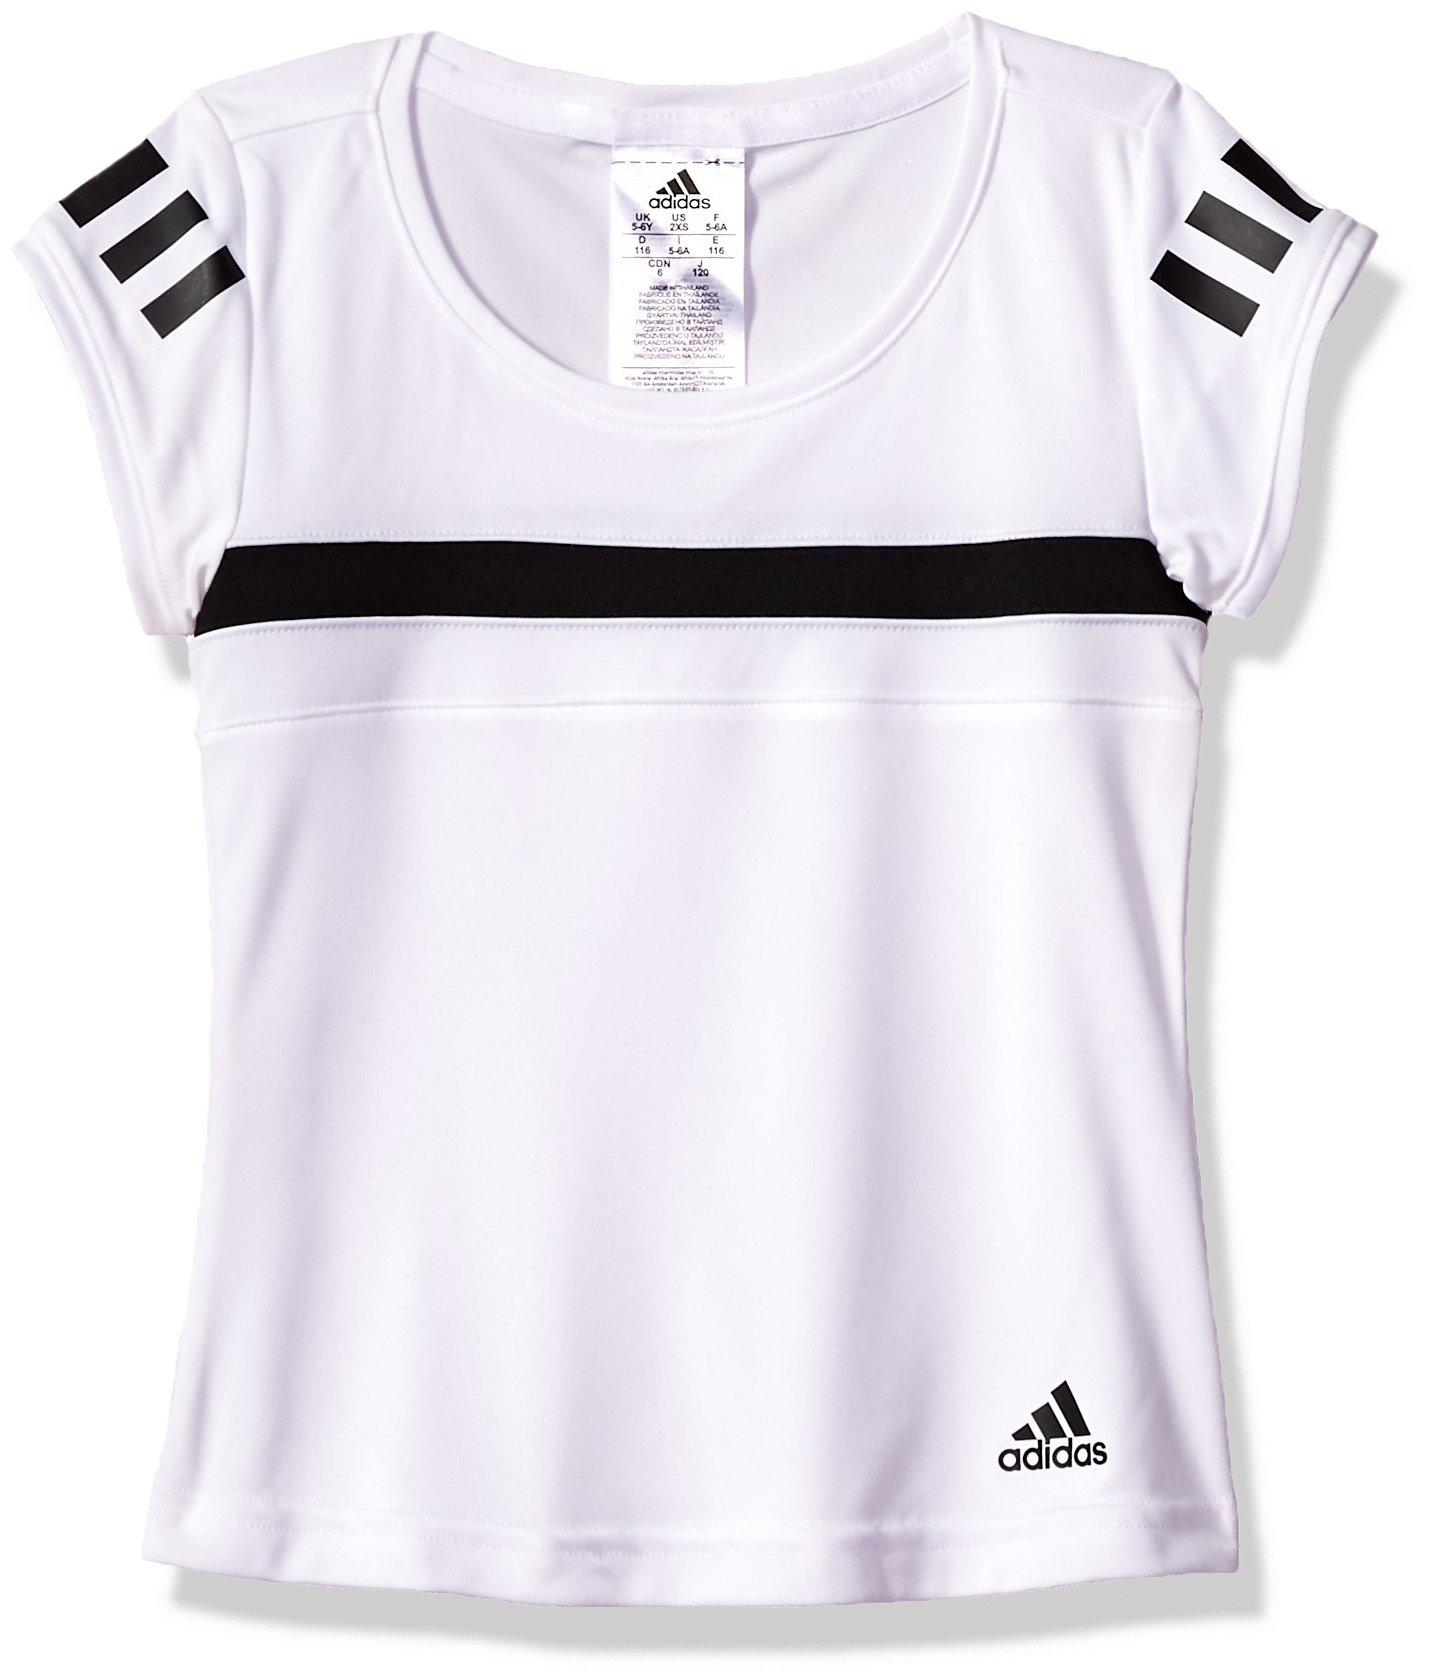 adidas Girl's Youth Tennis Girls Club Tee, White, X-Large